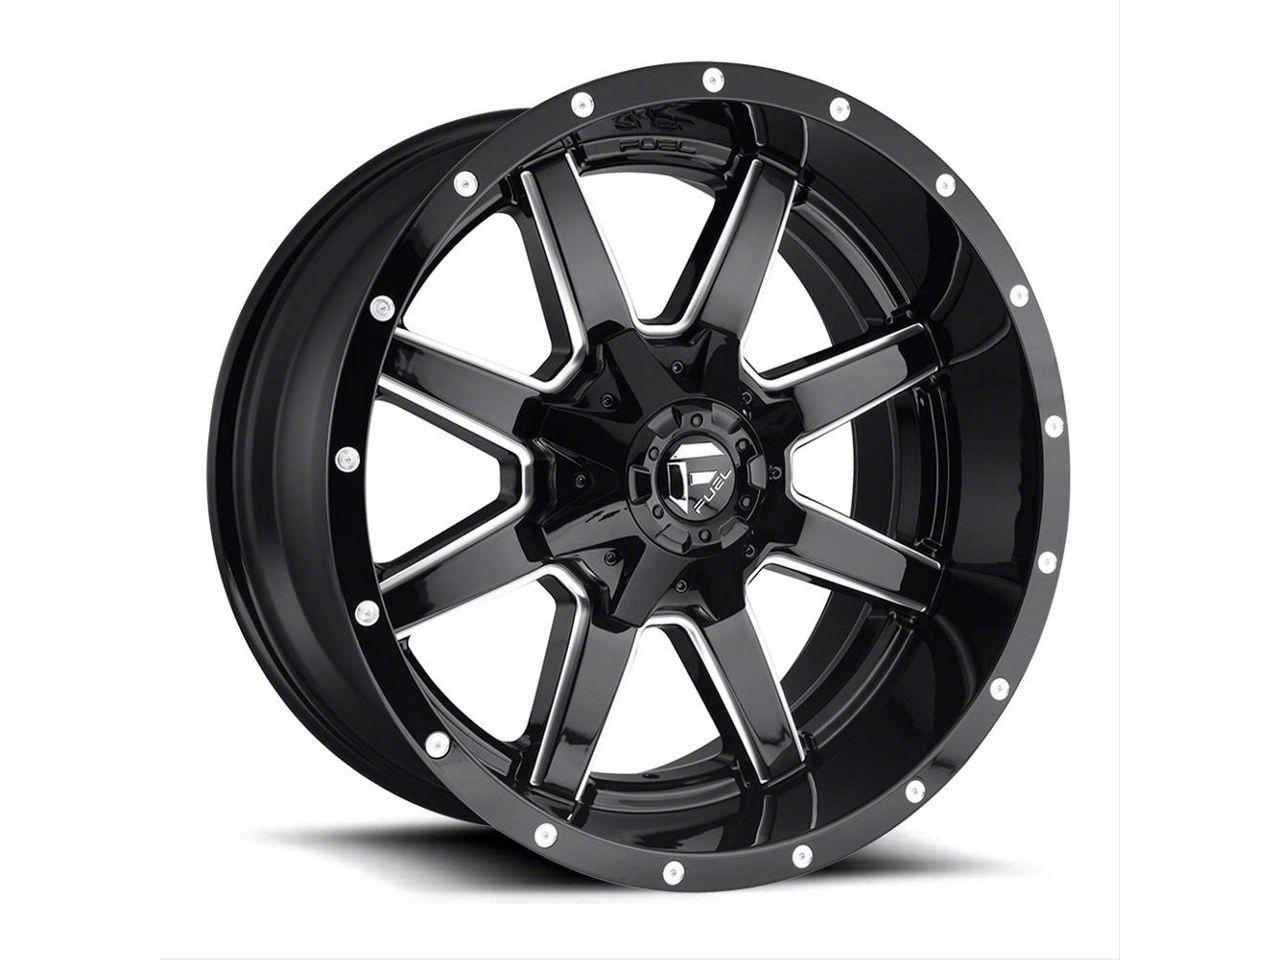 Fuel Wheels Maverick Gloss Black Milled 6-Lug Wheel - 22x10 (99-18 Silverado 1500)